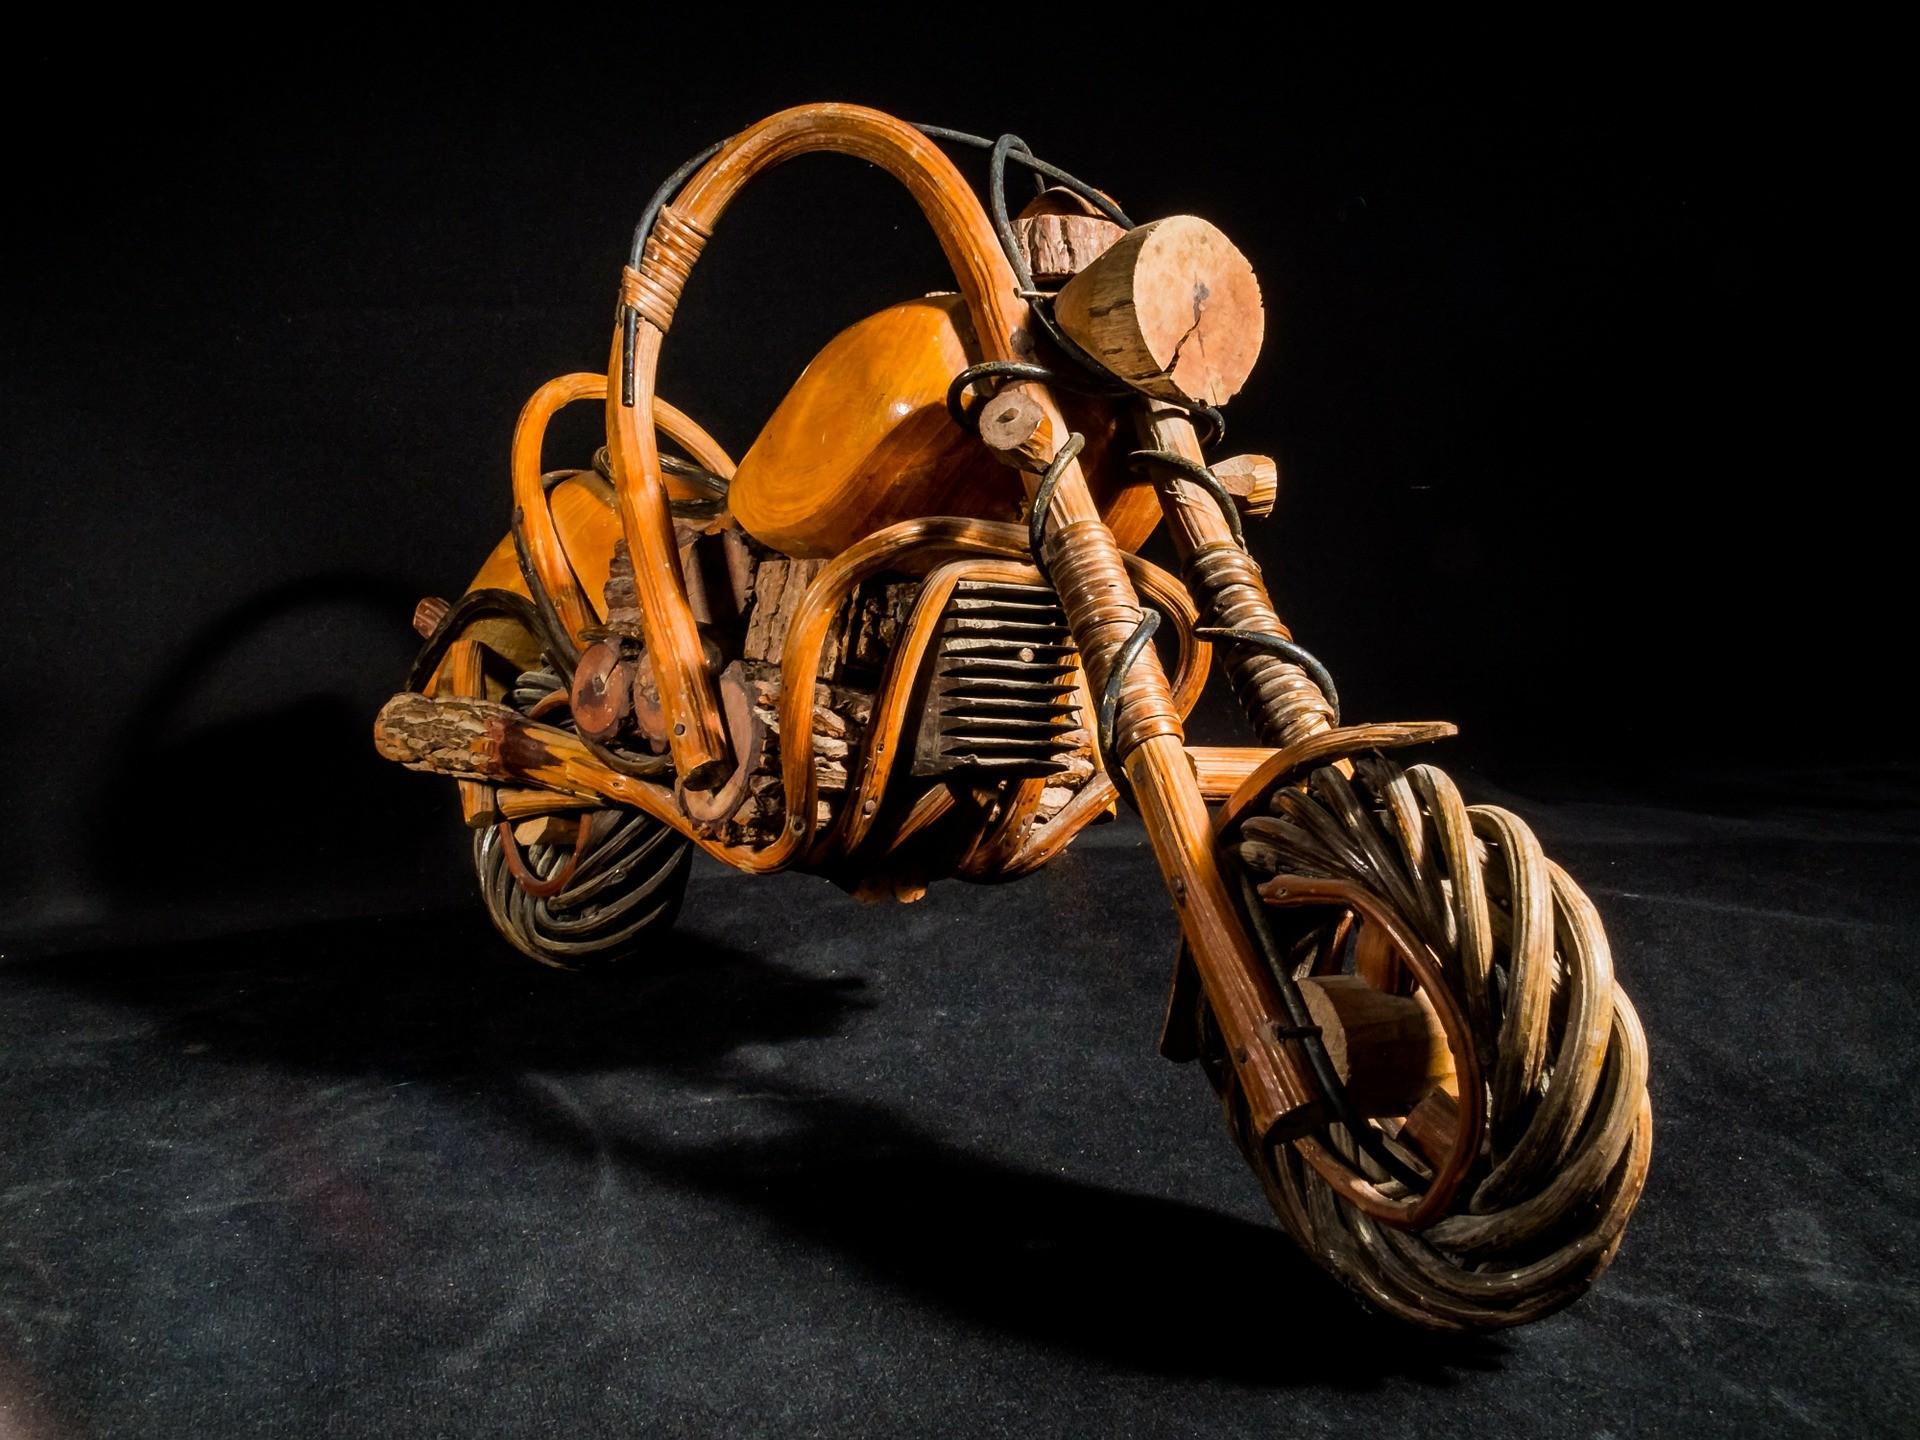 moto-design-proto-de-de-reve